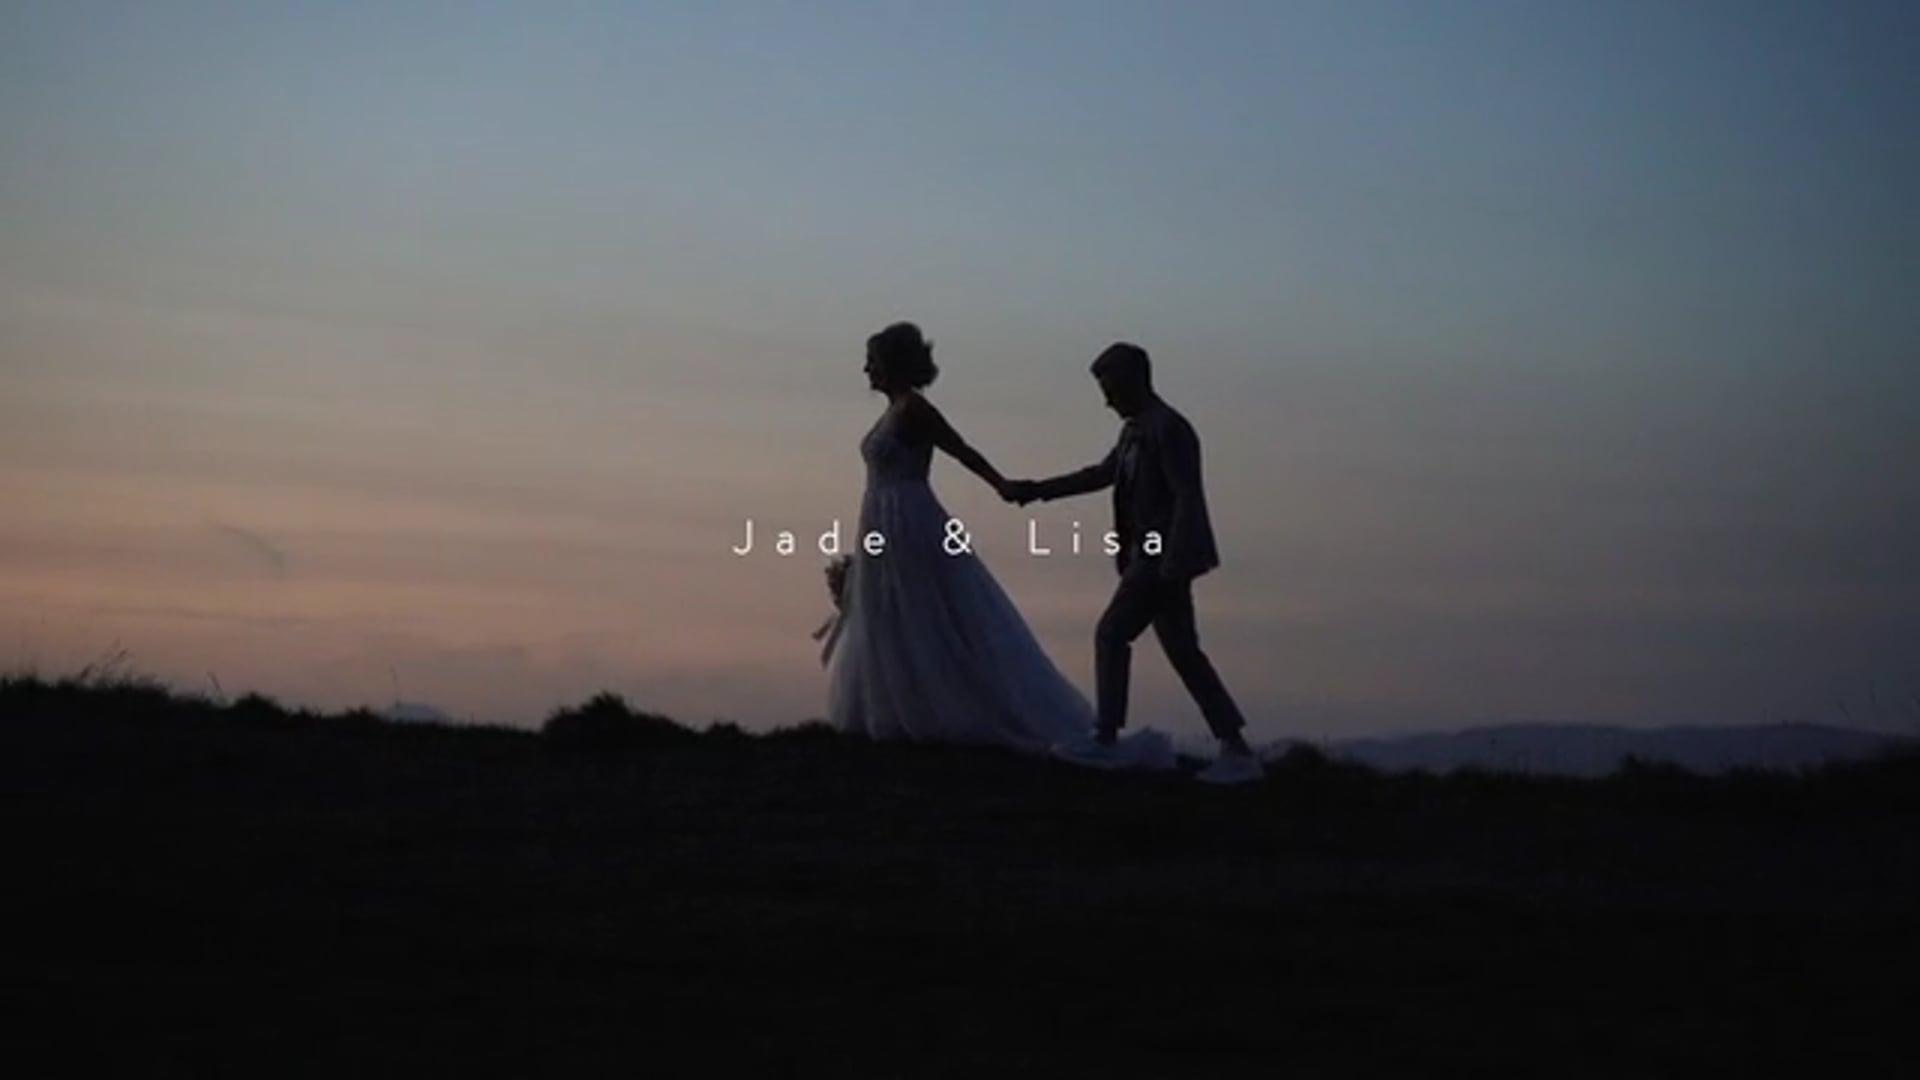 Jade & Lisa Highlights 26.9.2020